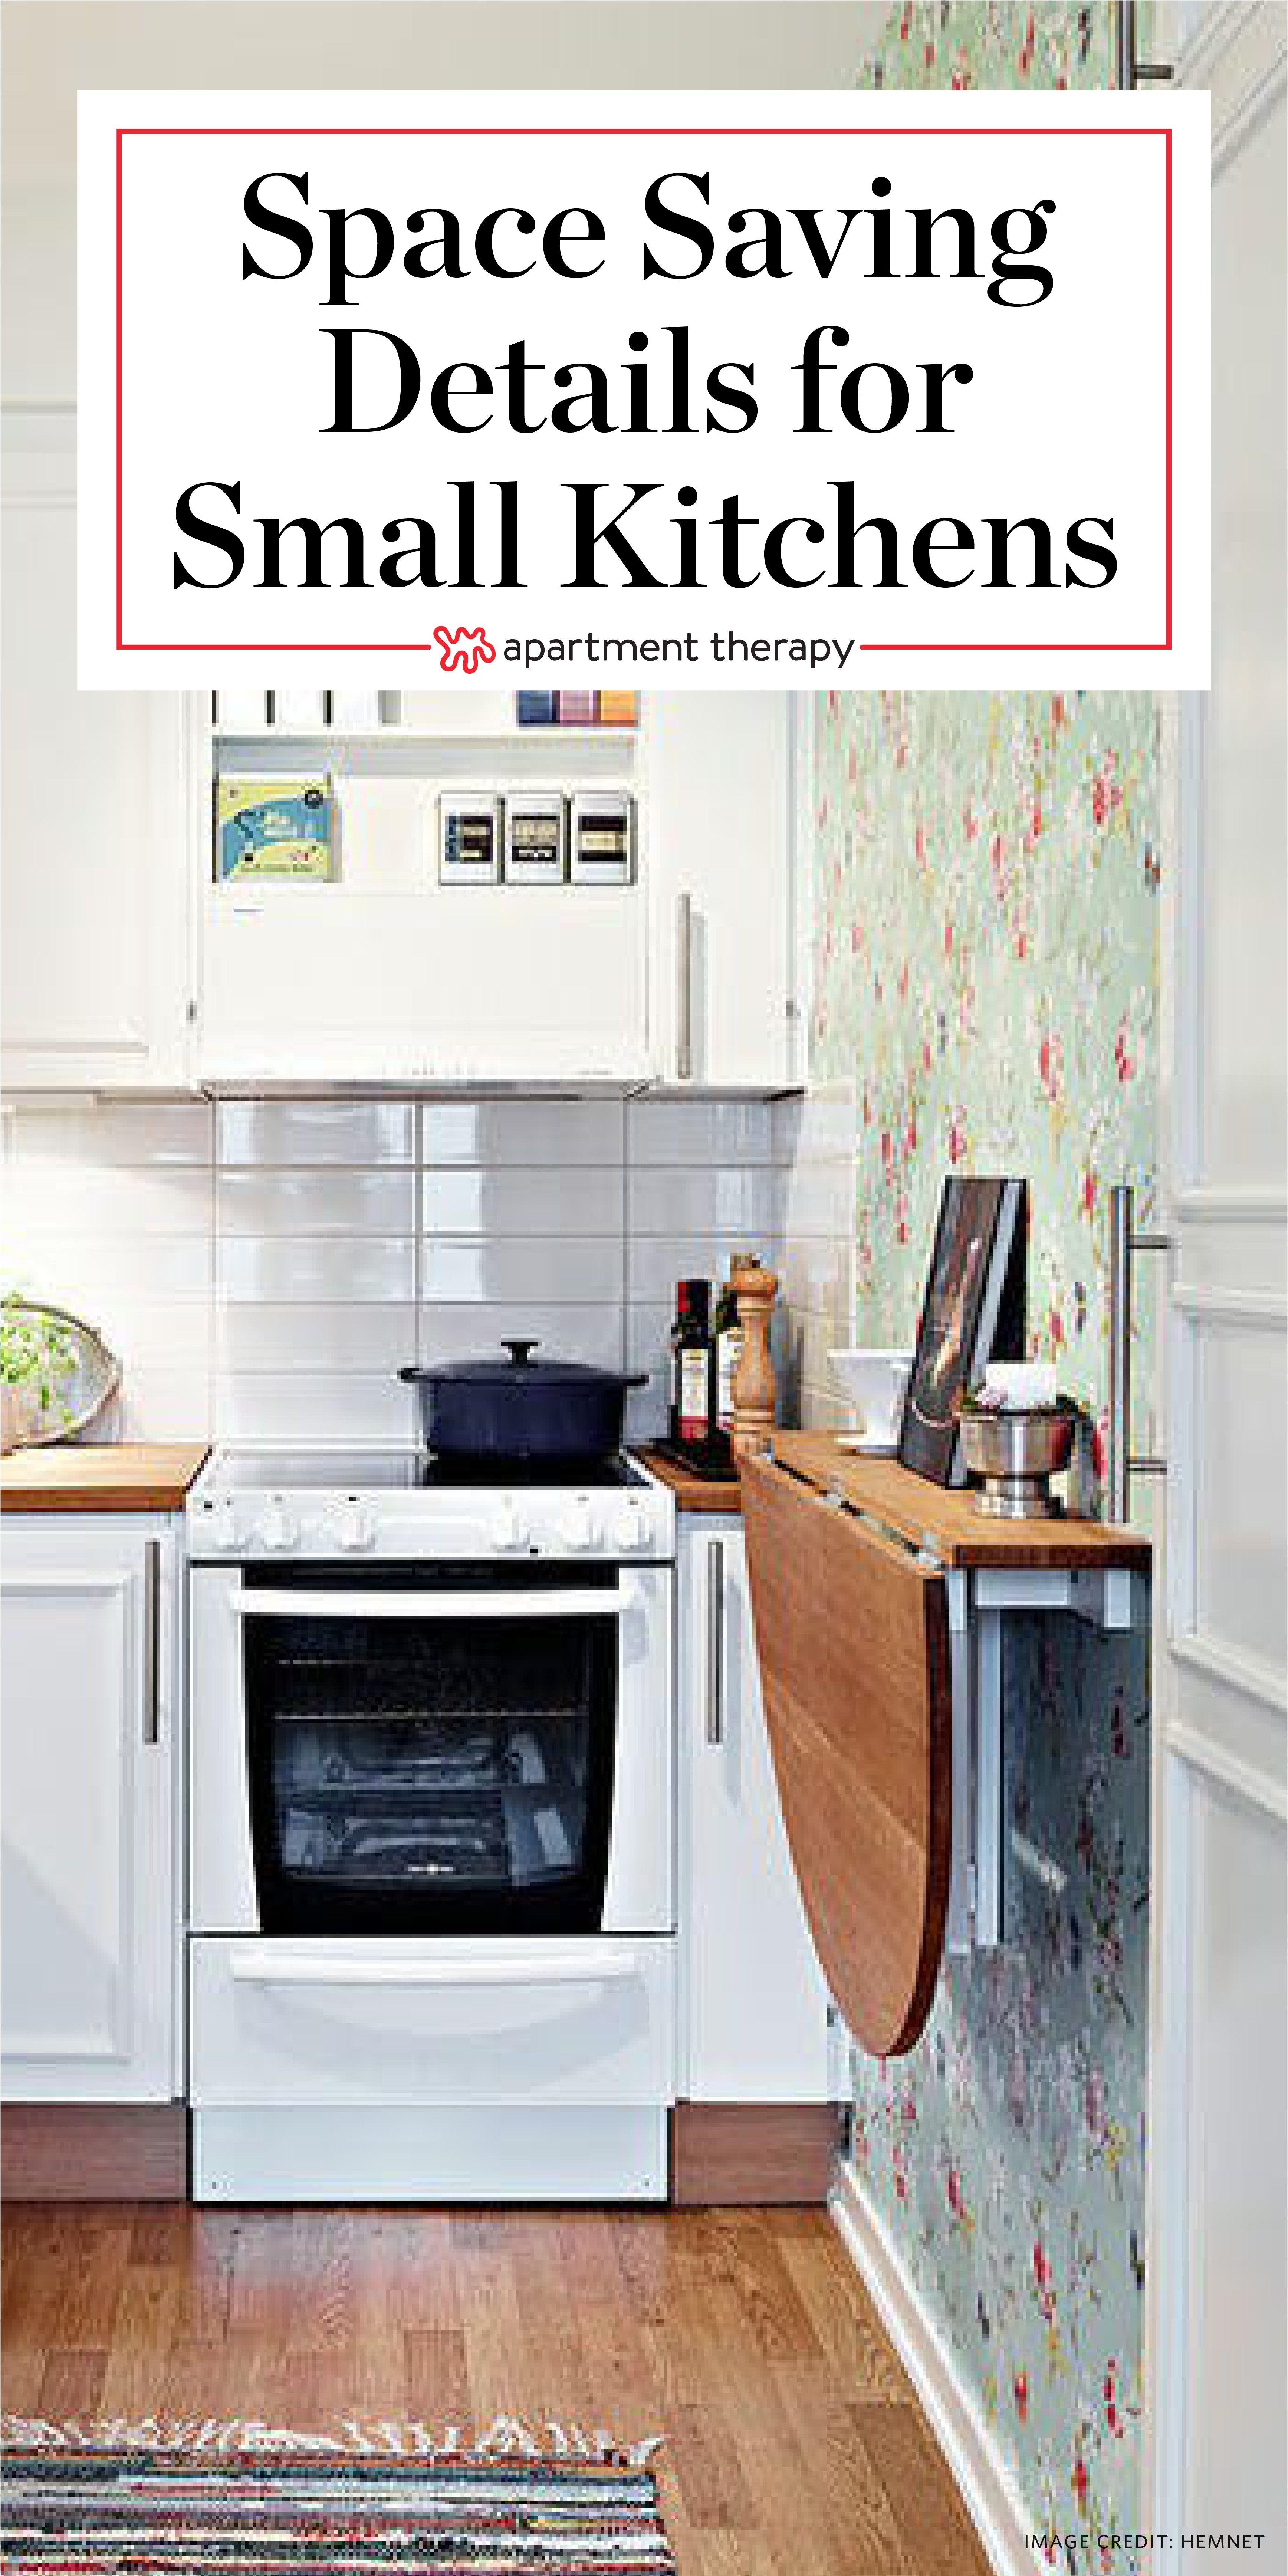 Small Space Saving Kitchen Decor Color Schemes Ideas Color Decor Kitchen Space Saving Kitchen Small Apartment Kitchen Kitchen Storage Space